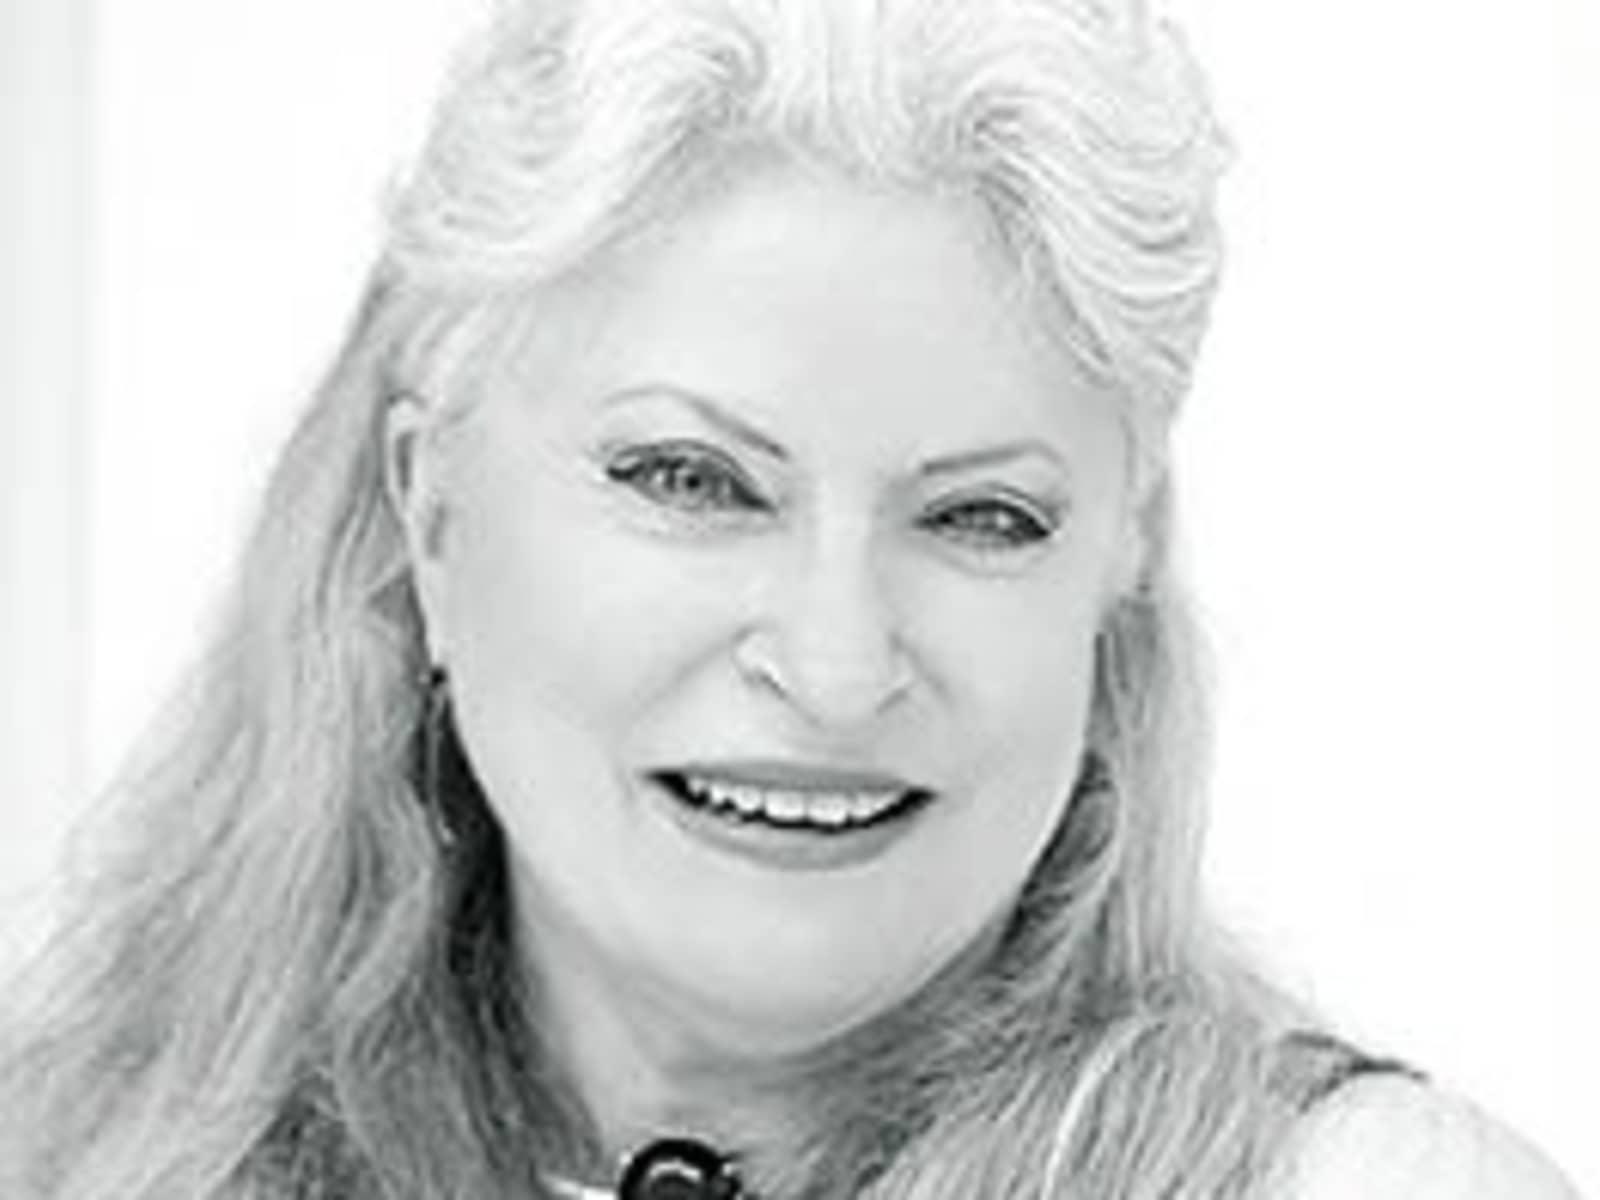 Rev. merriam joan from Boynton Beach, Florida, United States